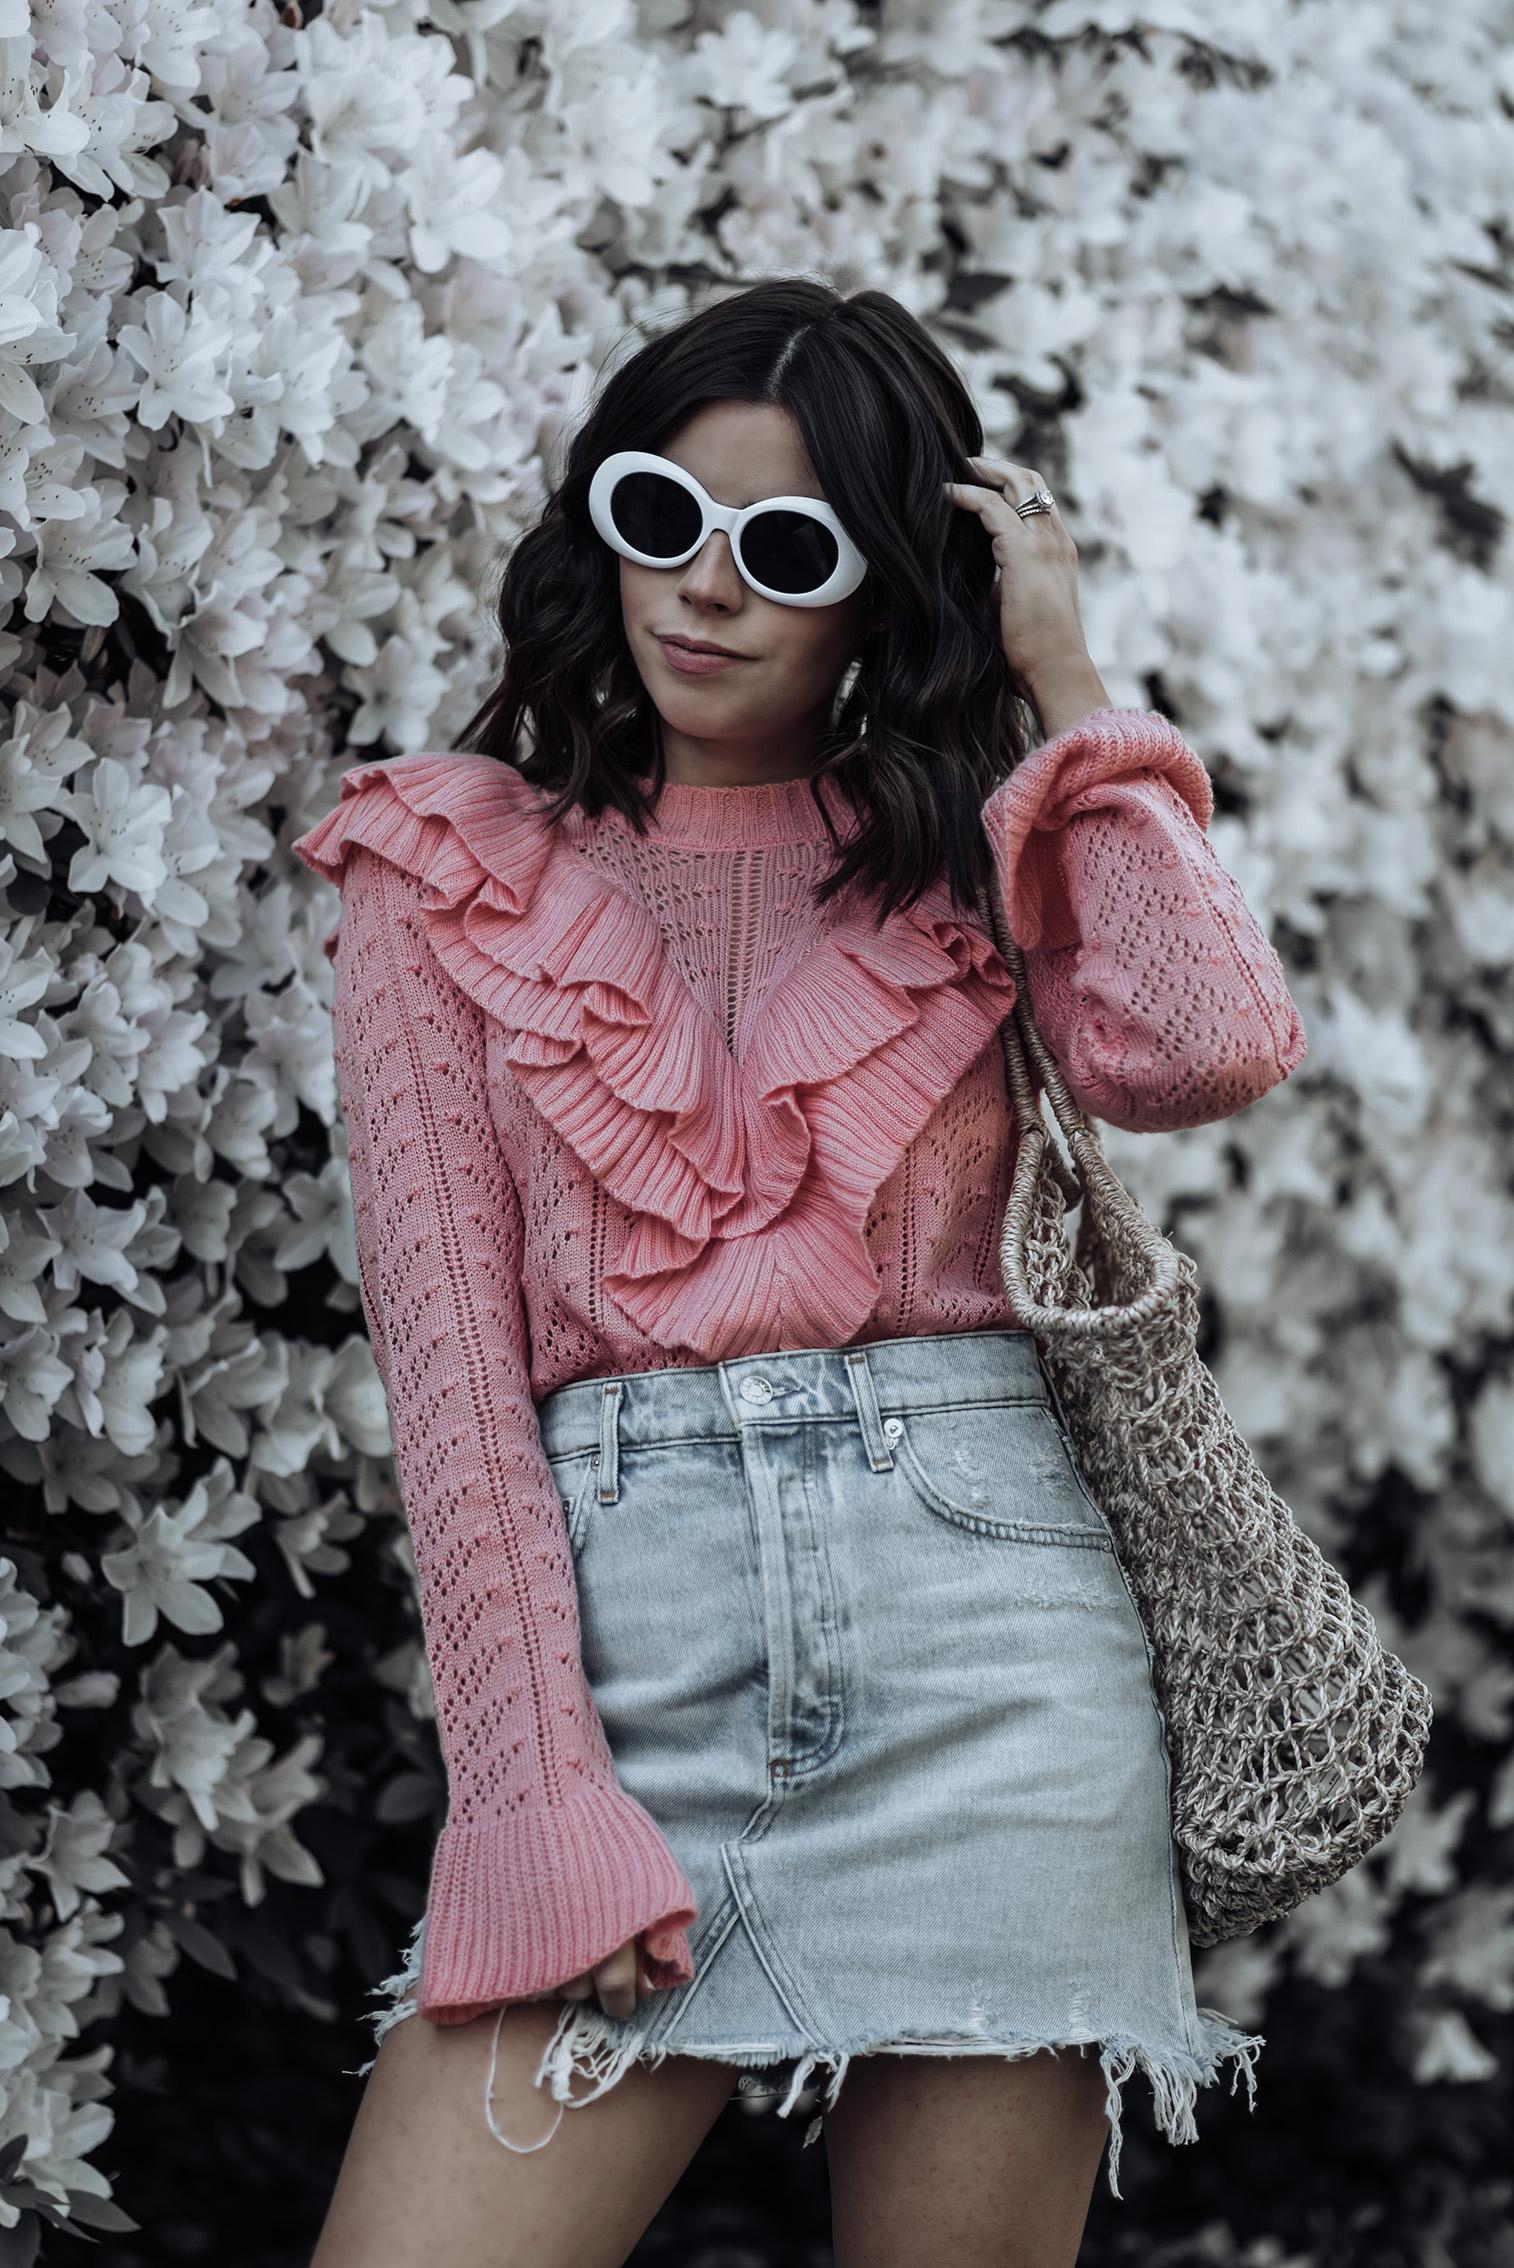 Manny Tularosa Sweater | Agolde High Waisted Skirt | Marina Basket Tote | {C/O}White Oval Shaped Sunnies | Superga Platform Sneakers | #streetstyle #denimskirtoutfits #Tularosa #platformsneakers #liketkit